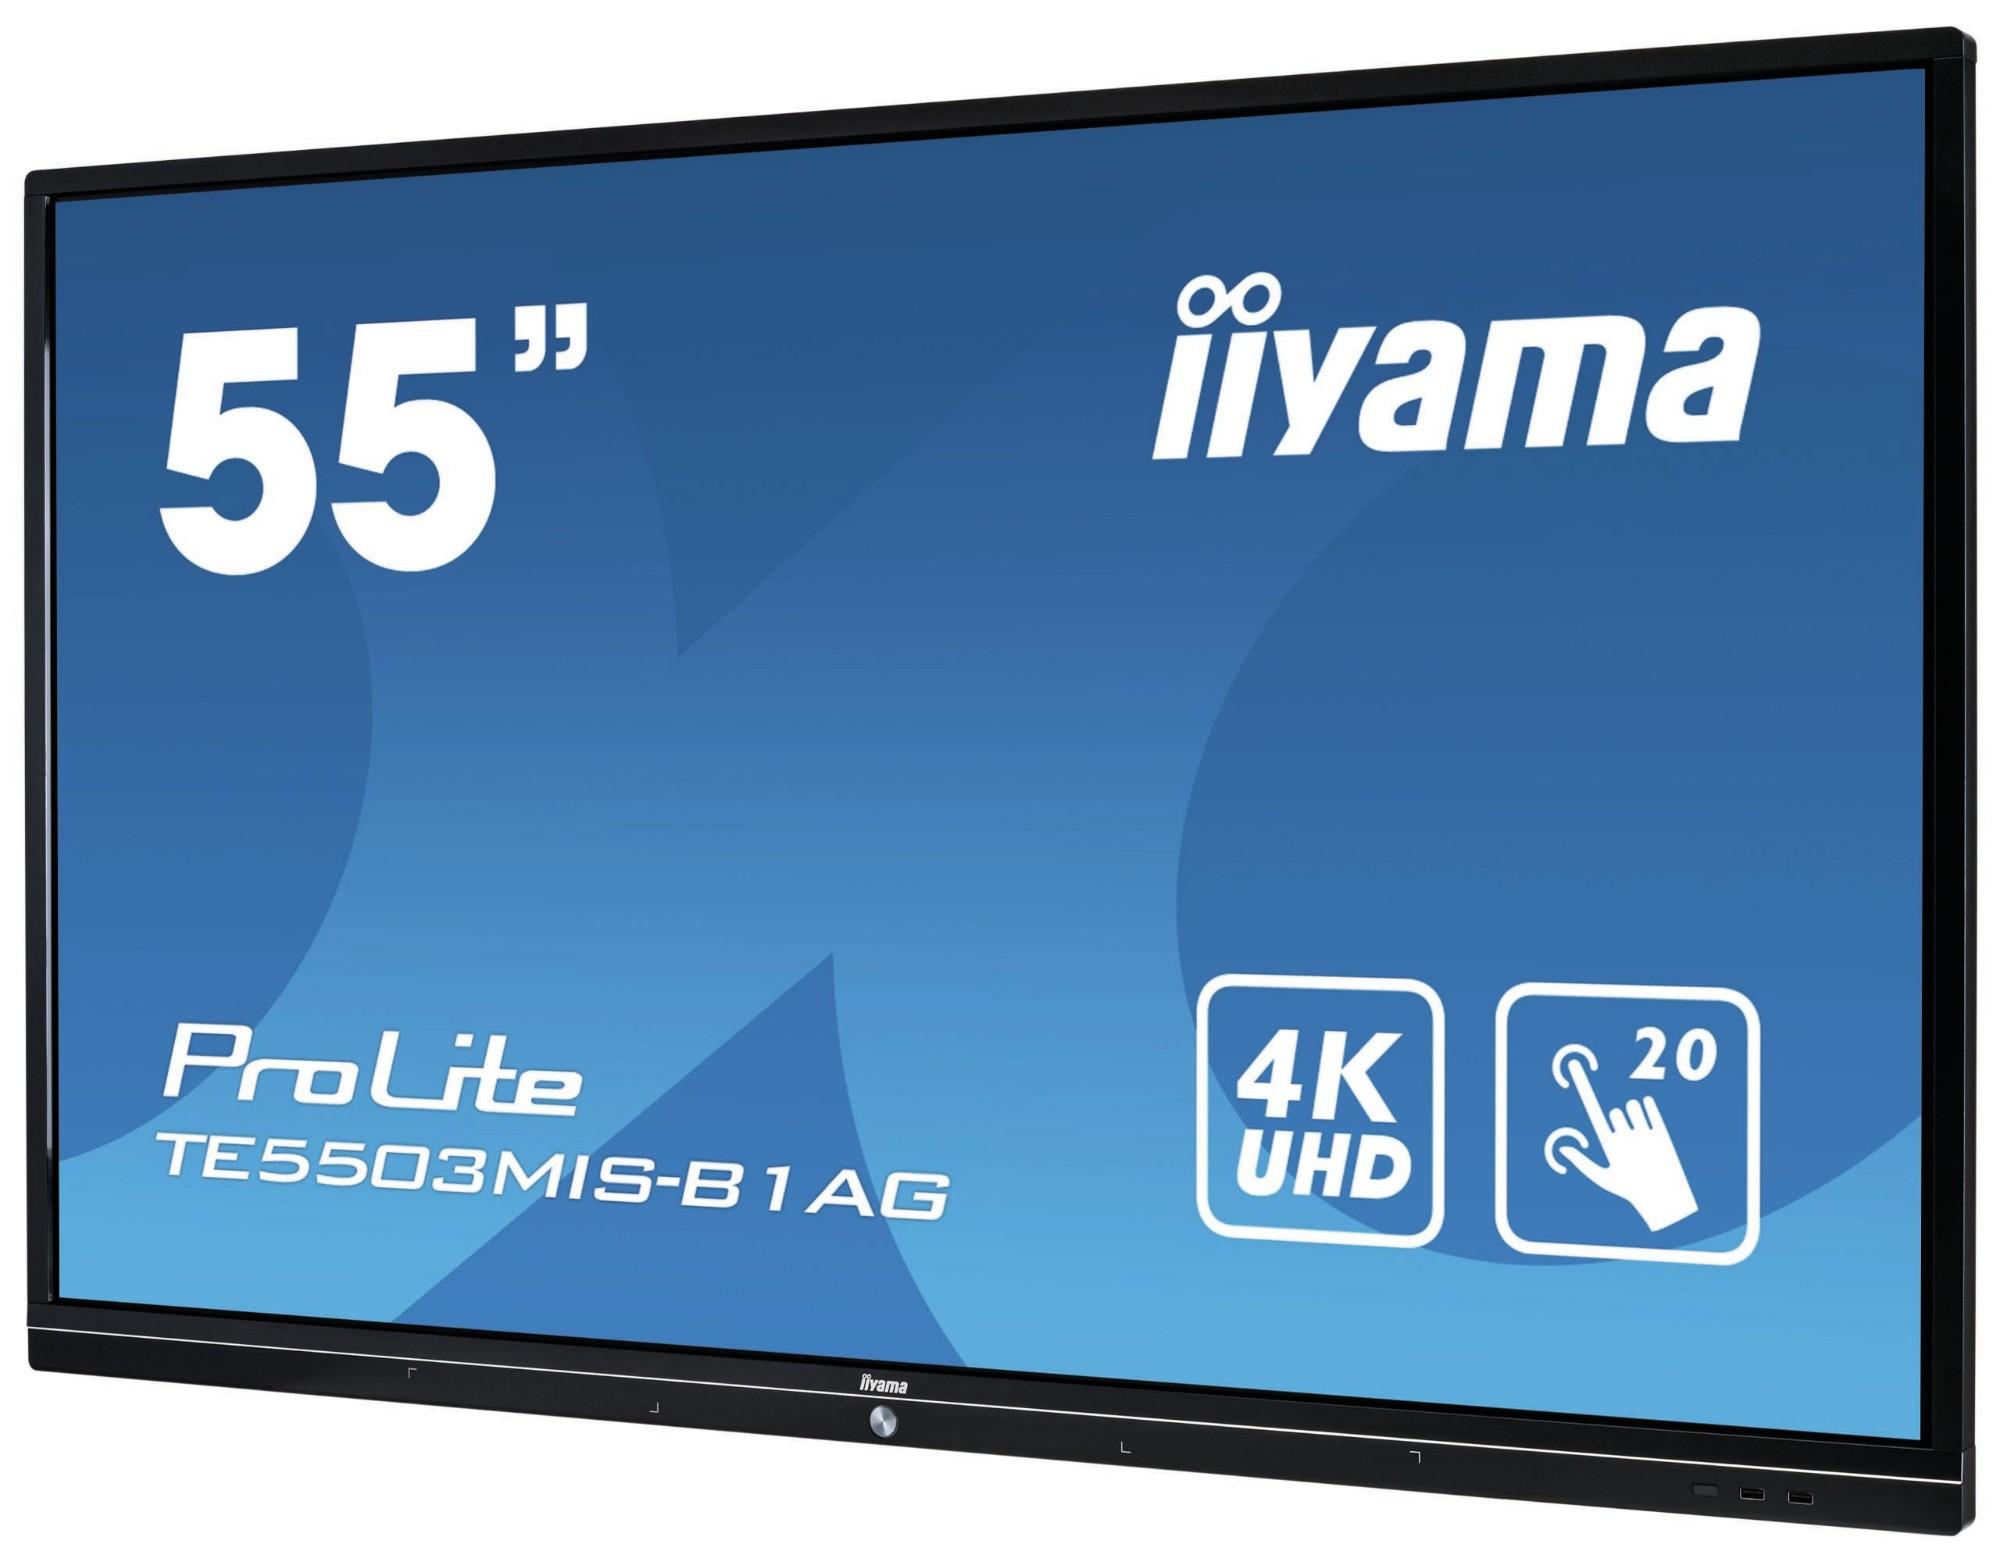 iiyama ProLite TE5503MIS-B1AG touch screen monitor 139.7 cm (55